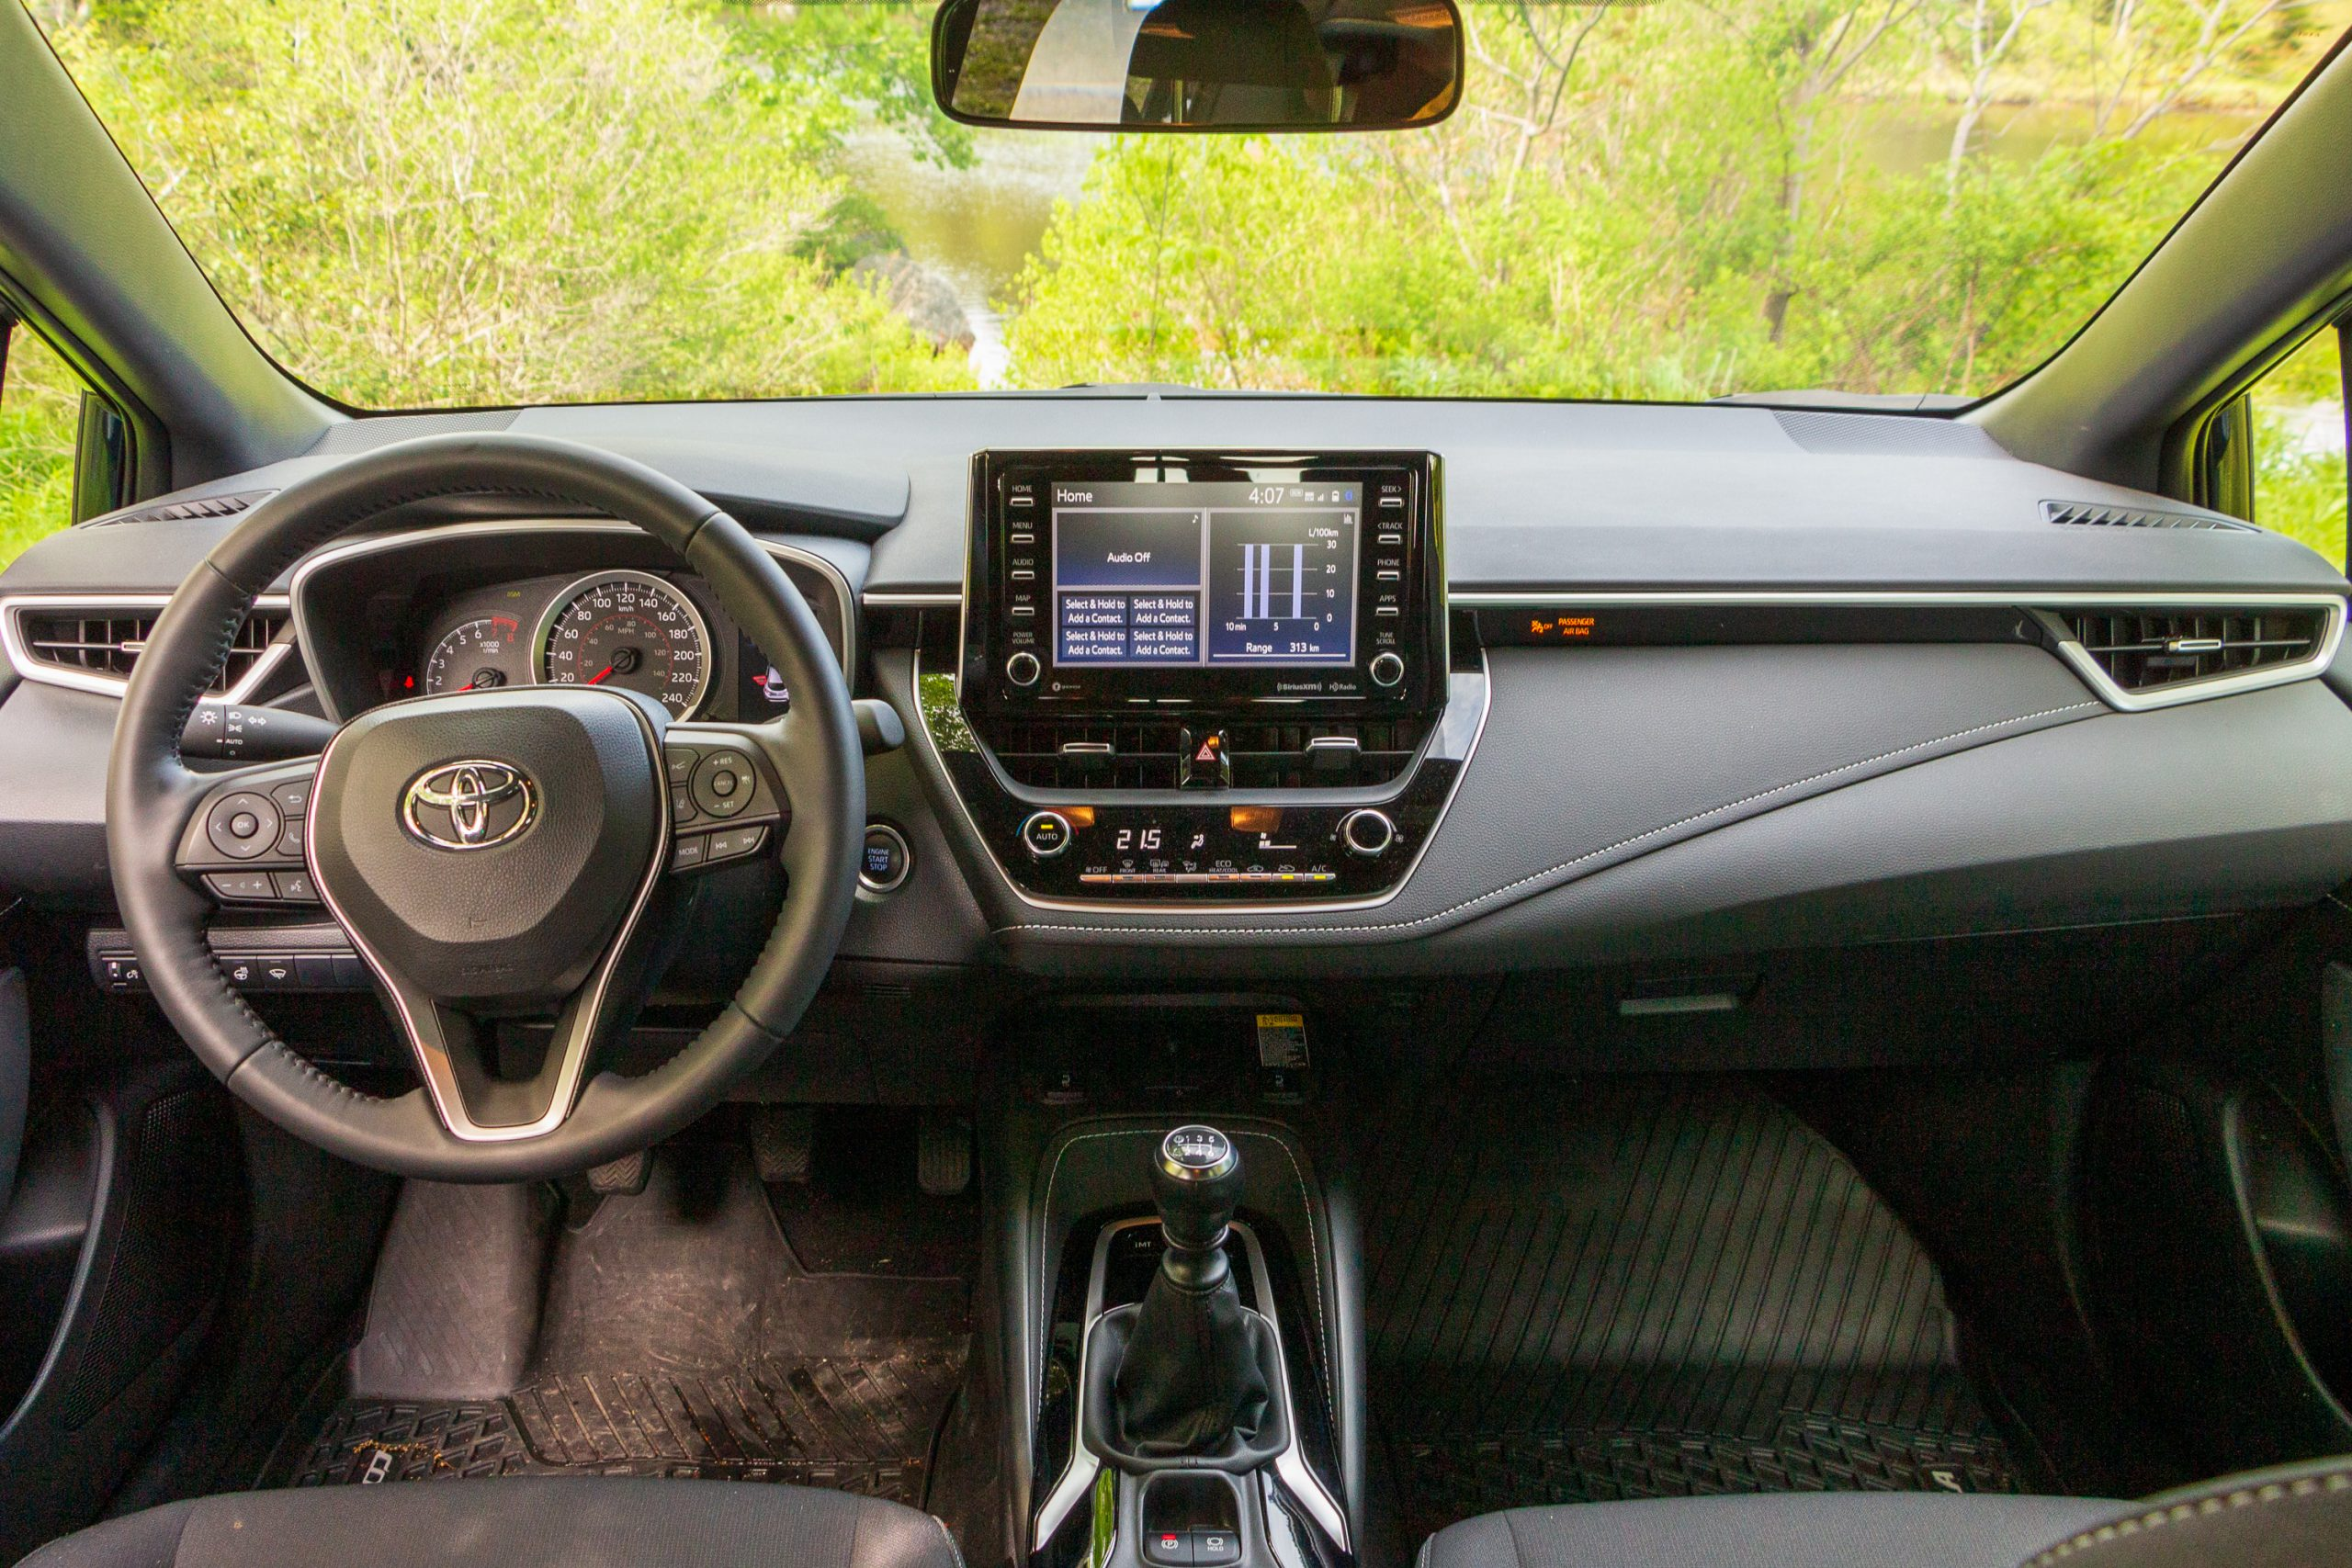 2021 Honda Civic vs 2021 Toyota Corolla